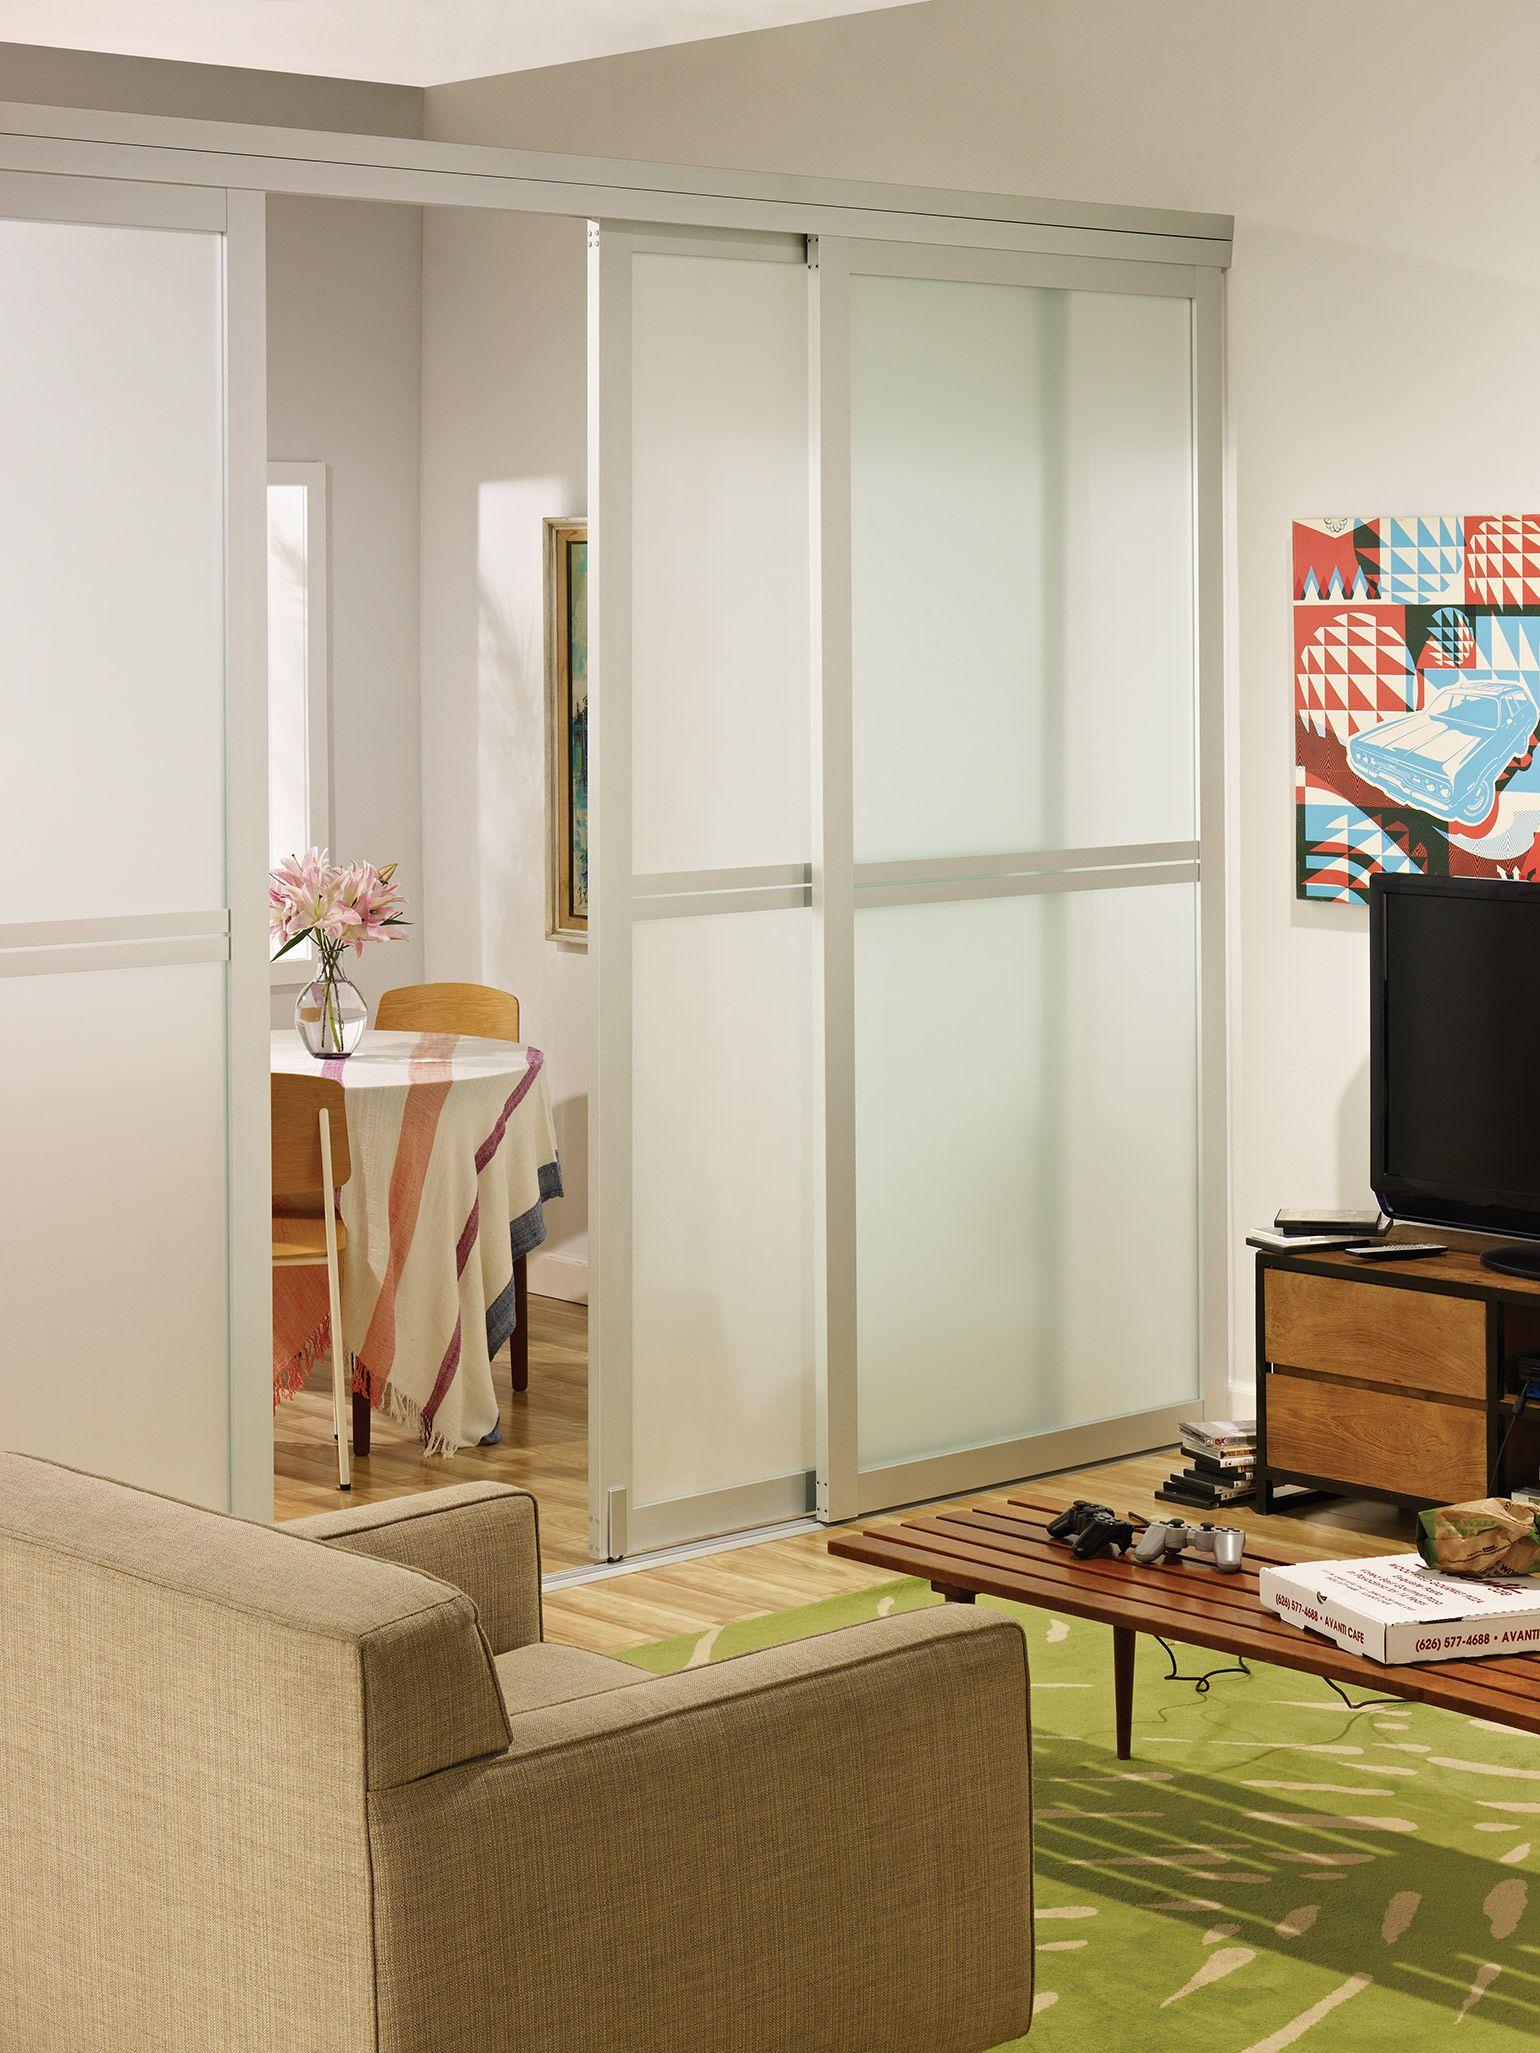 Game Room Sliding Glass Room Dividers Inspirational